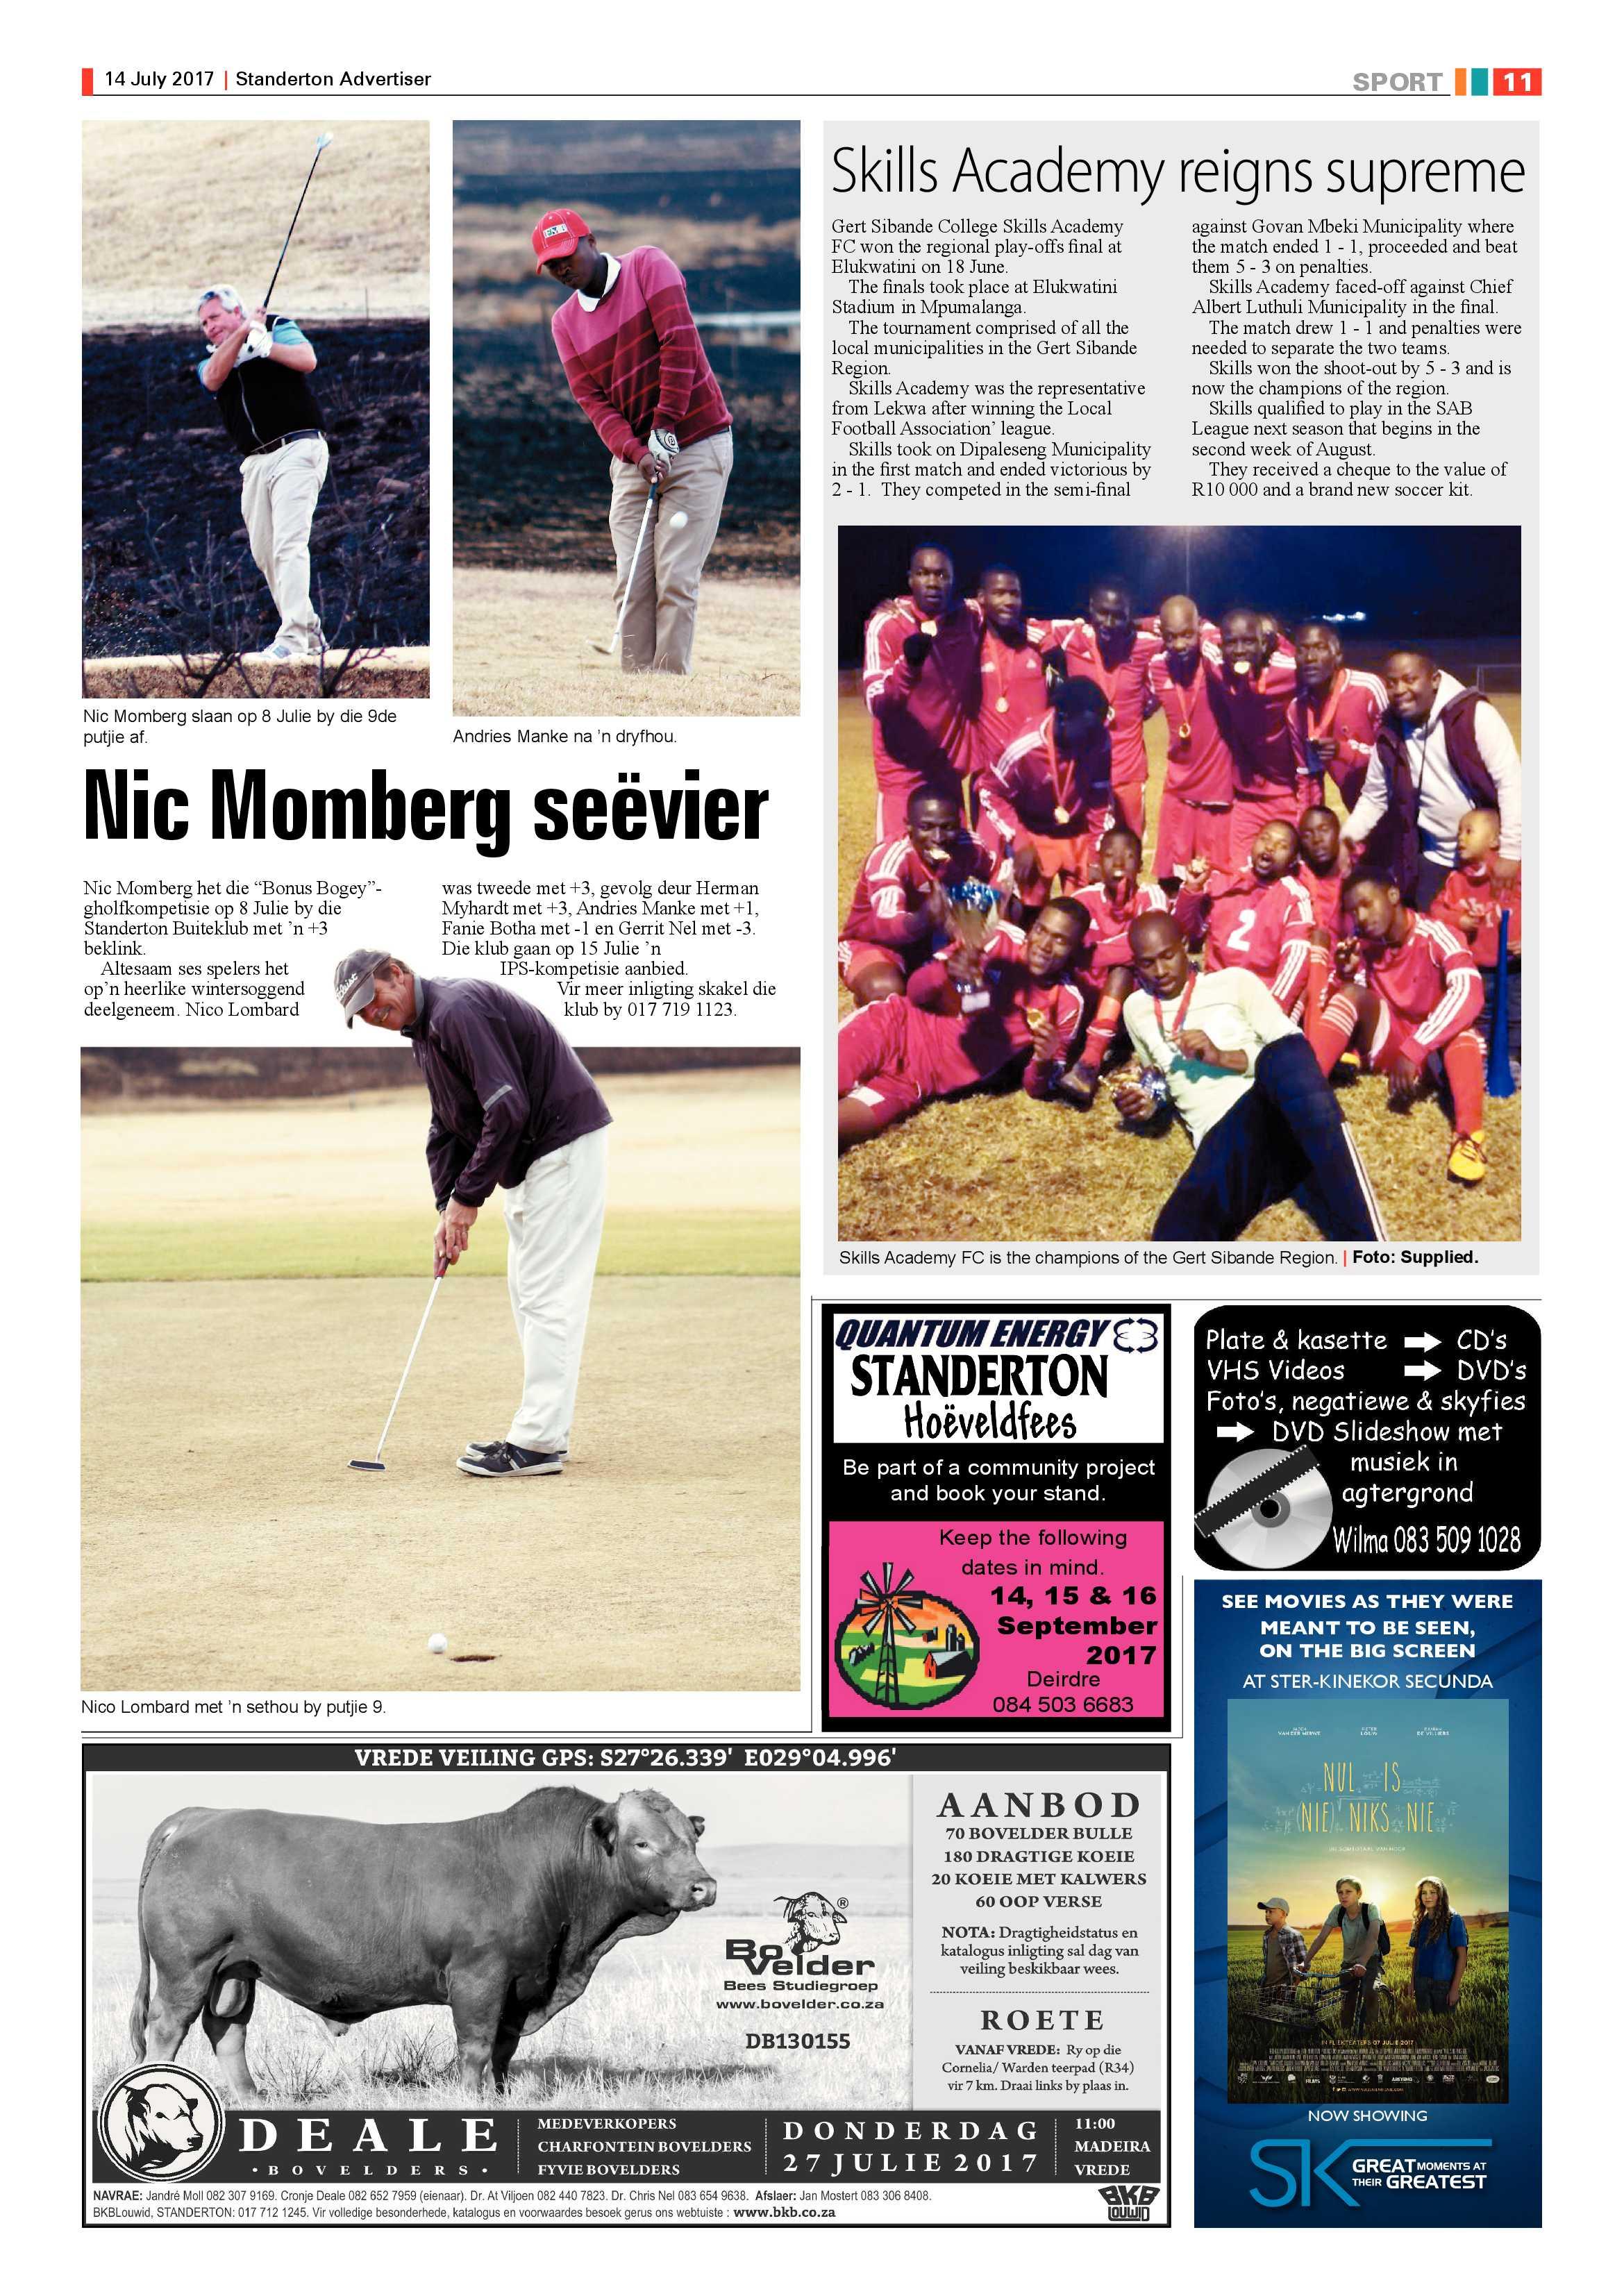 standerton-advertiser-14-july-2017-epapers-page-11